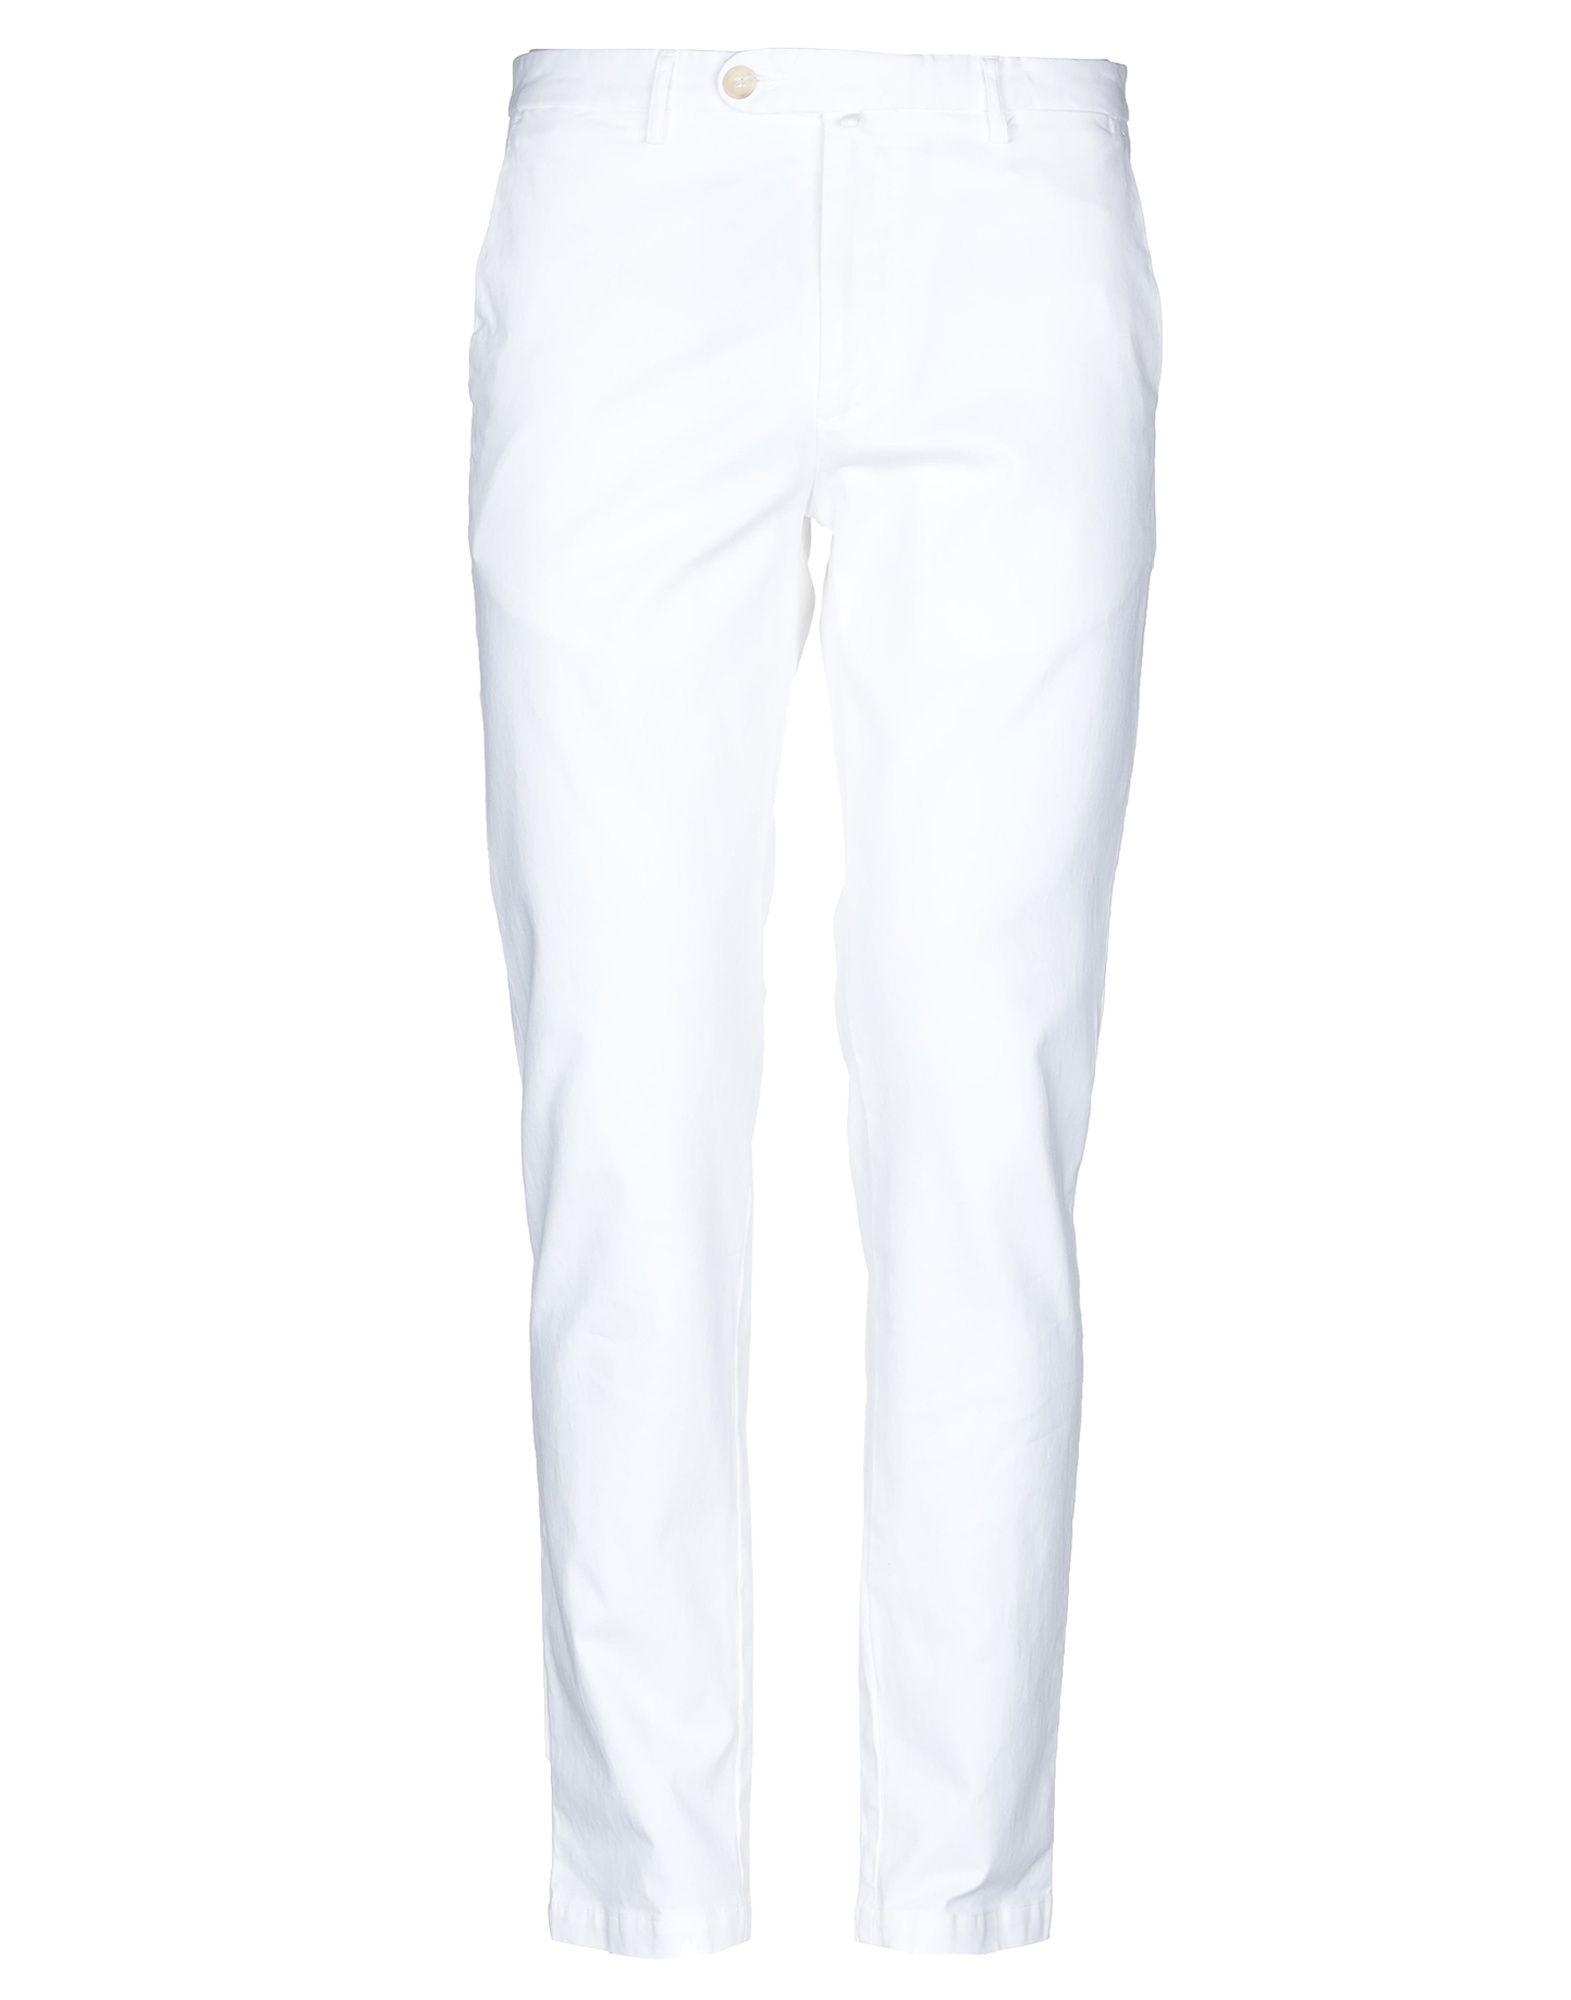 AUTHENTIC ORIGINAL VINTAGE STYLE Повседневные брюки [zob] original original j7kna 09 10 220v contactor original authentic 2pcs lot